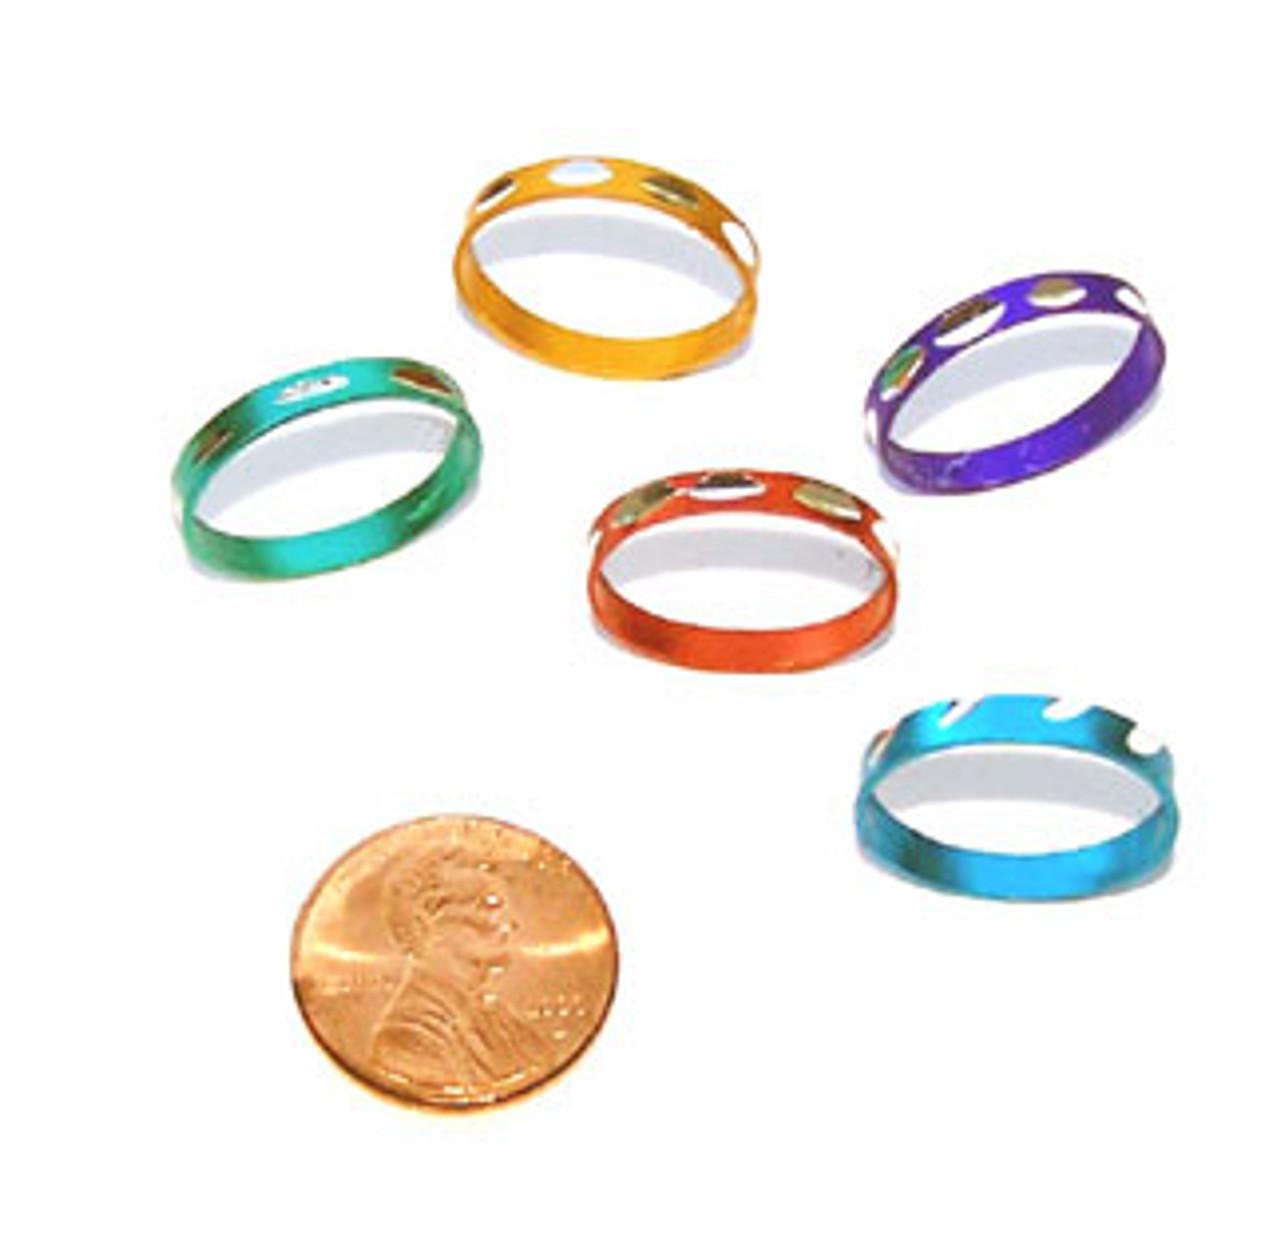 Cheap Toy Rings - Diamond Cut Toy Rings